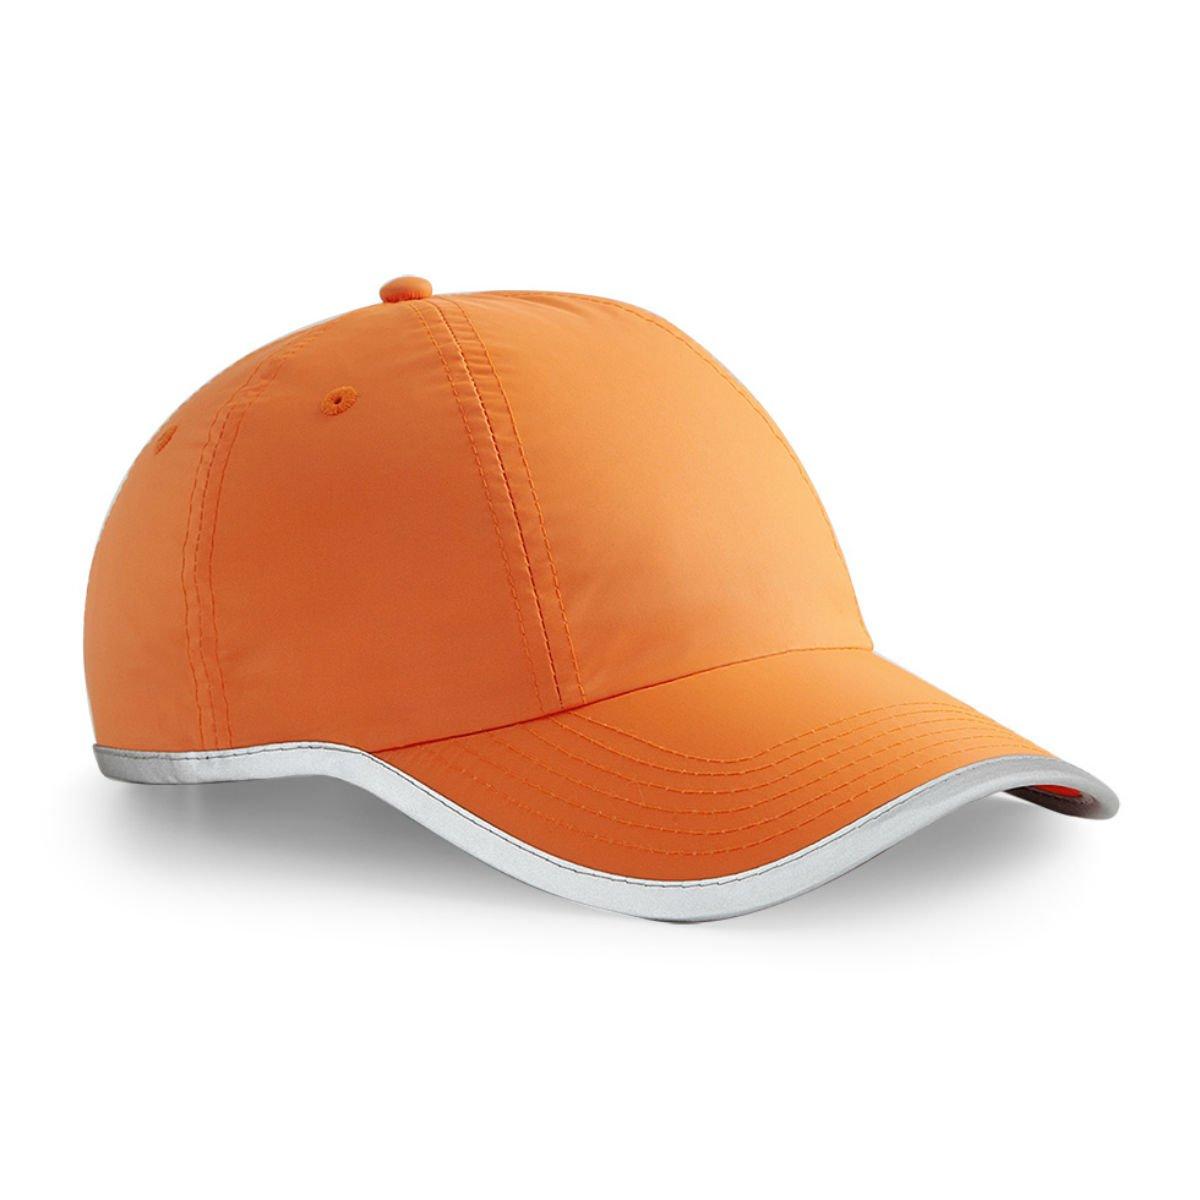 Beechfield Unisex Enhancef-Viz Cap